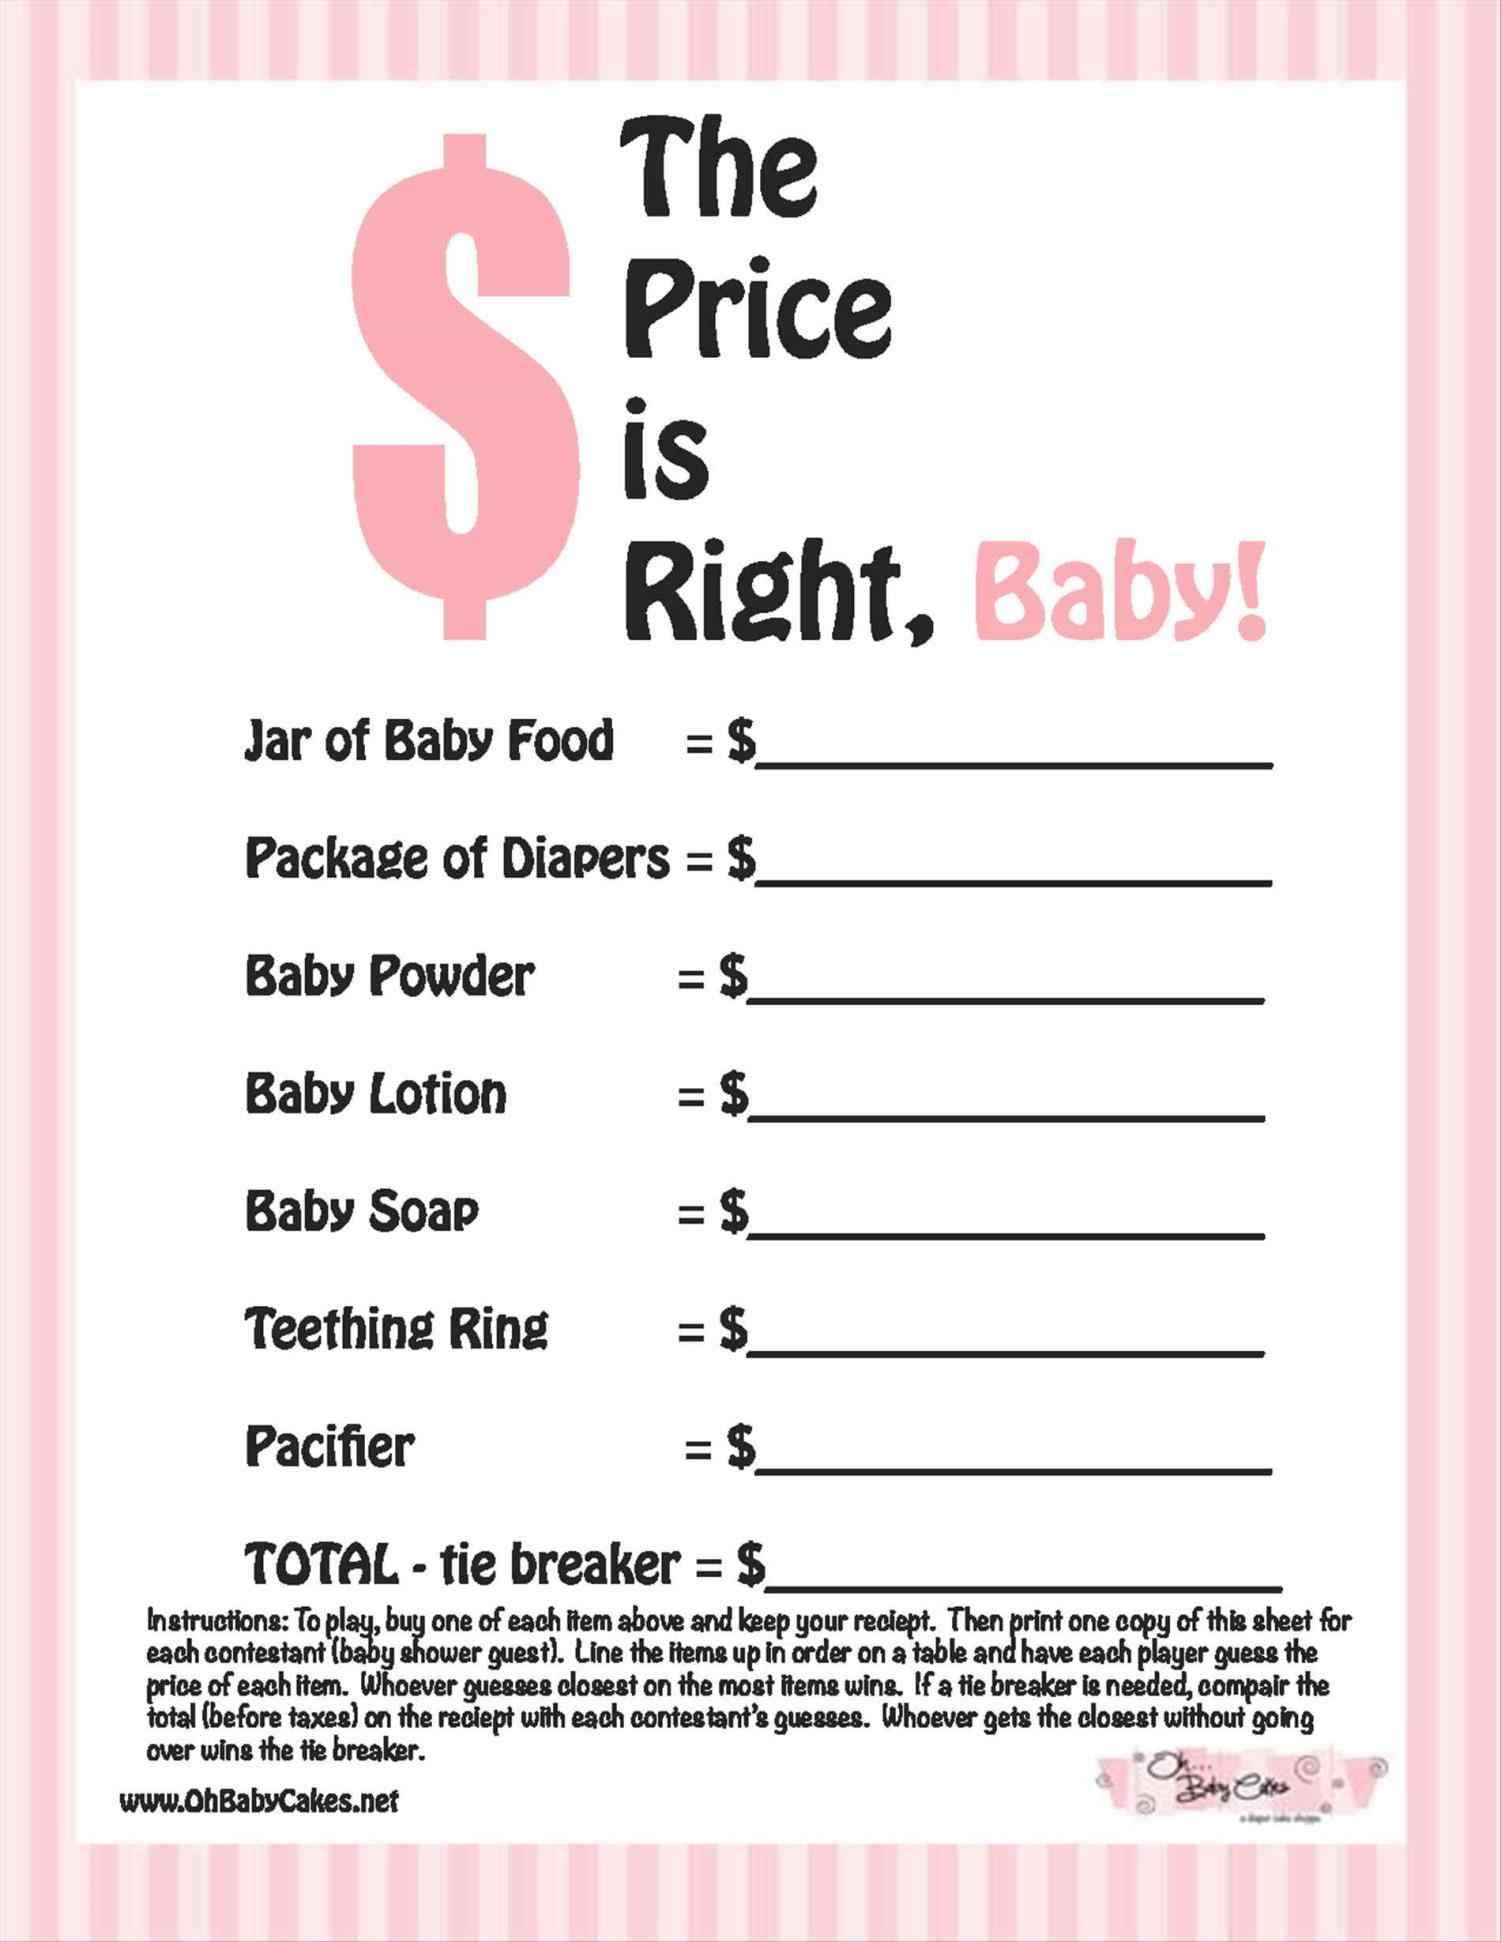 Crosswords Wedding Crossword Puzzle Printable Free Baby Shower Games - Free Printable Baby Shower Crossword Puzzle